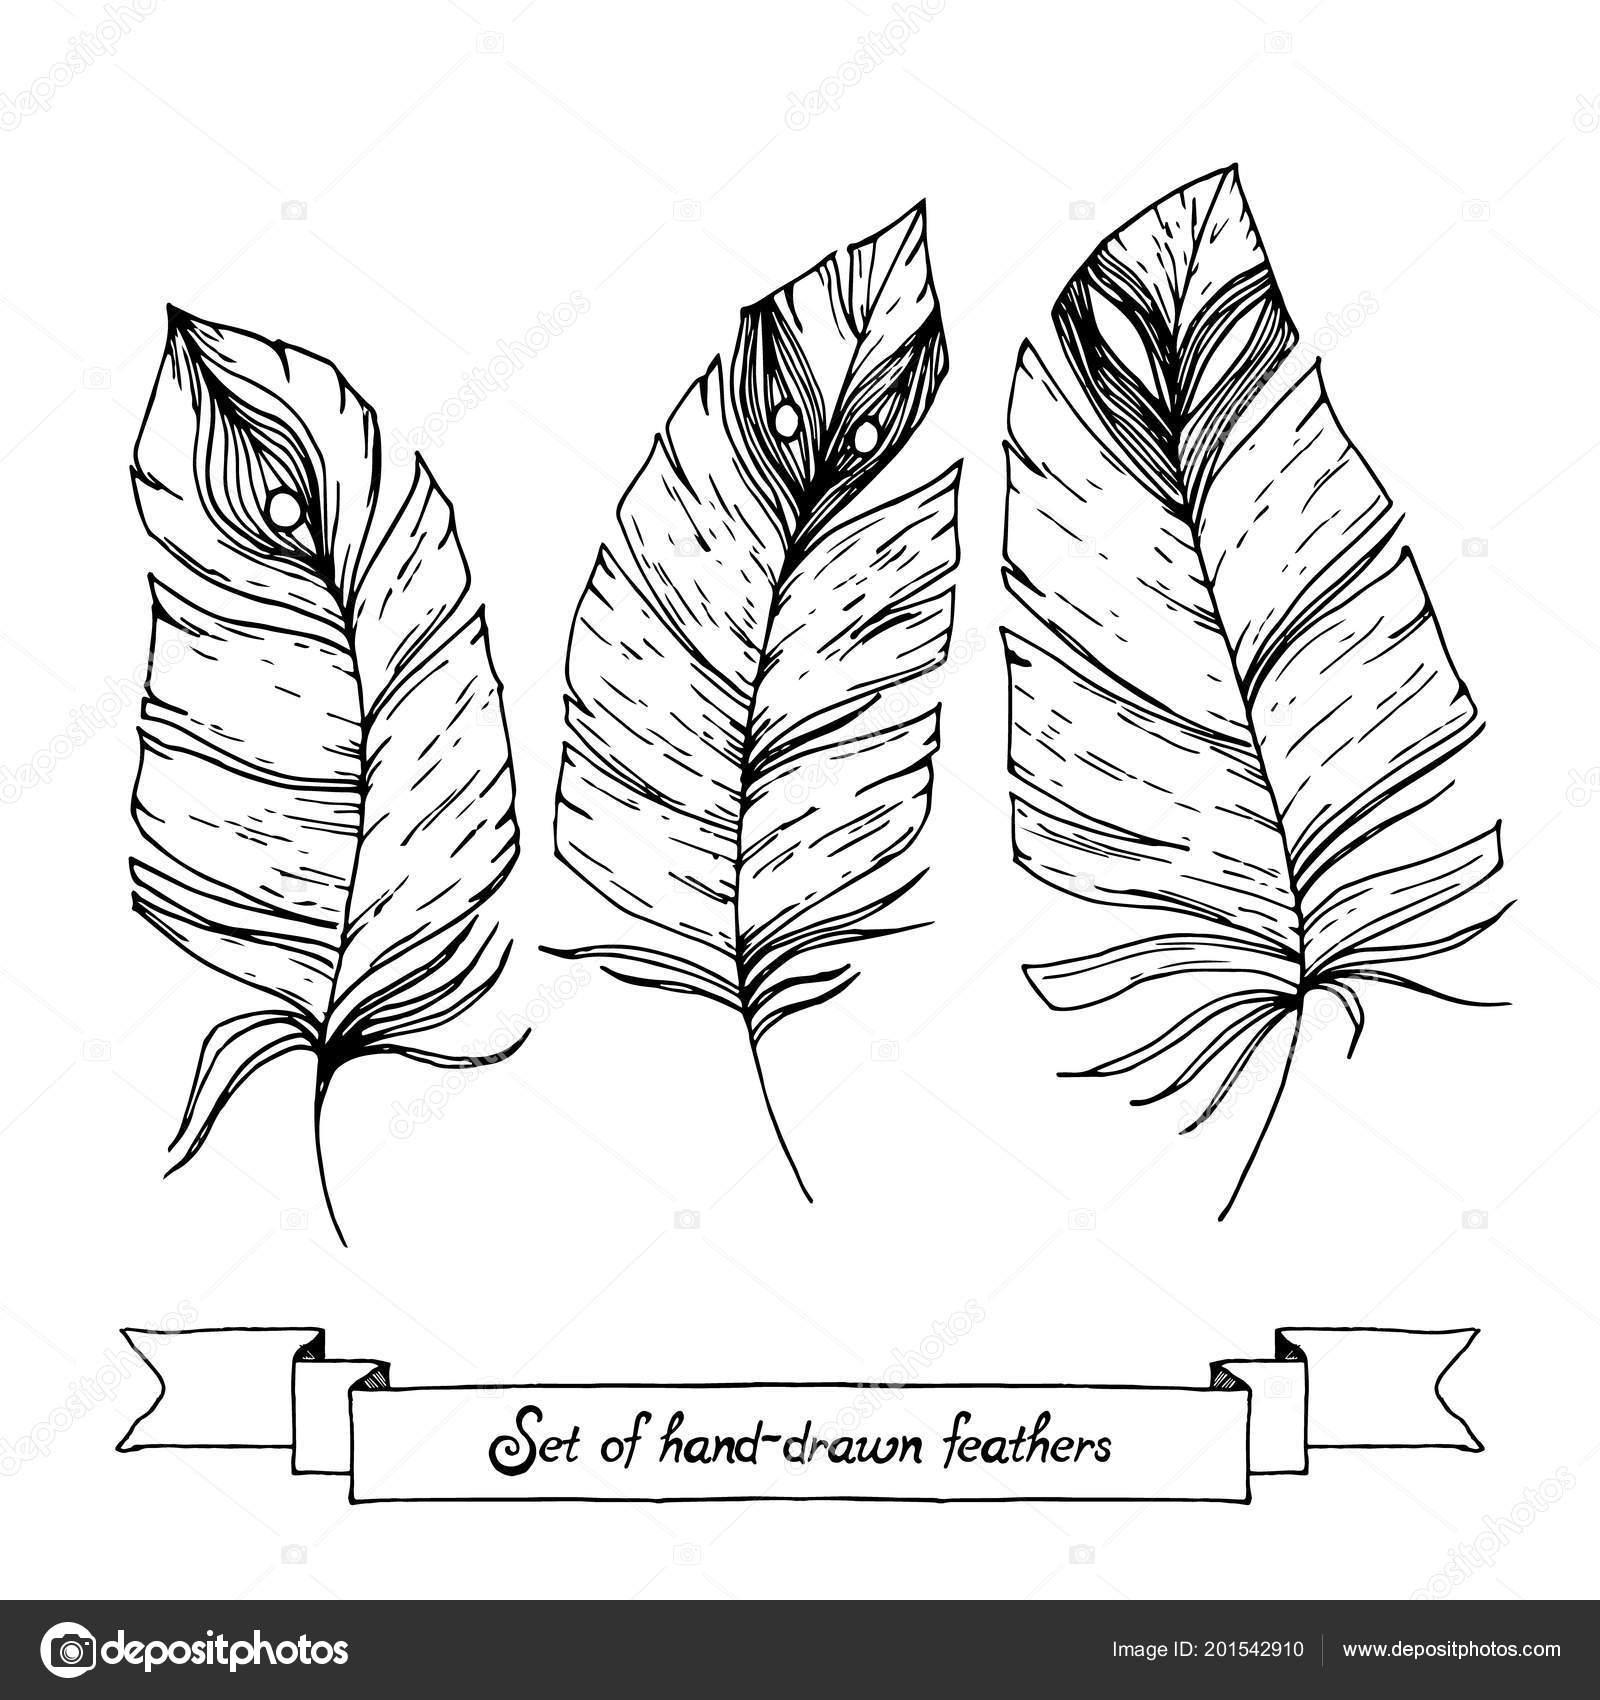 Conjunto De Croquis Dibujado Mano Doodle Plumas Aisladas Sobre Fondo